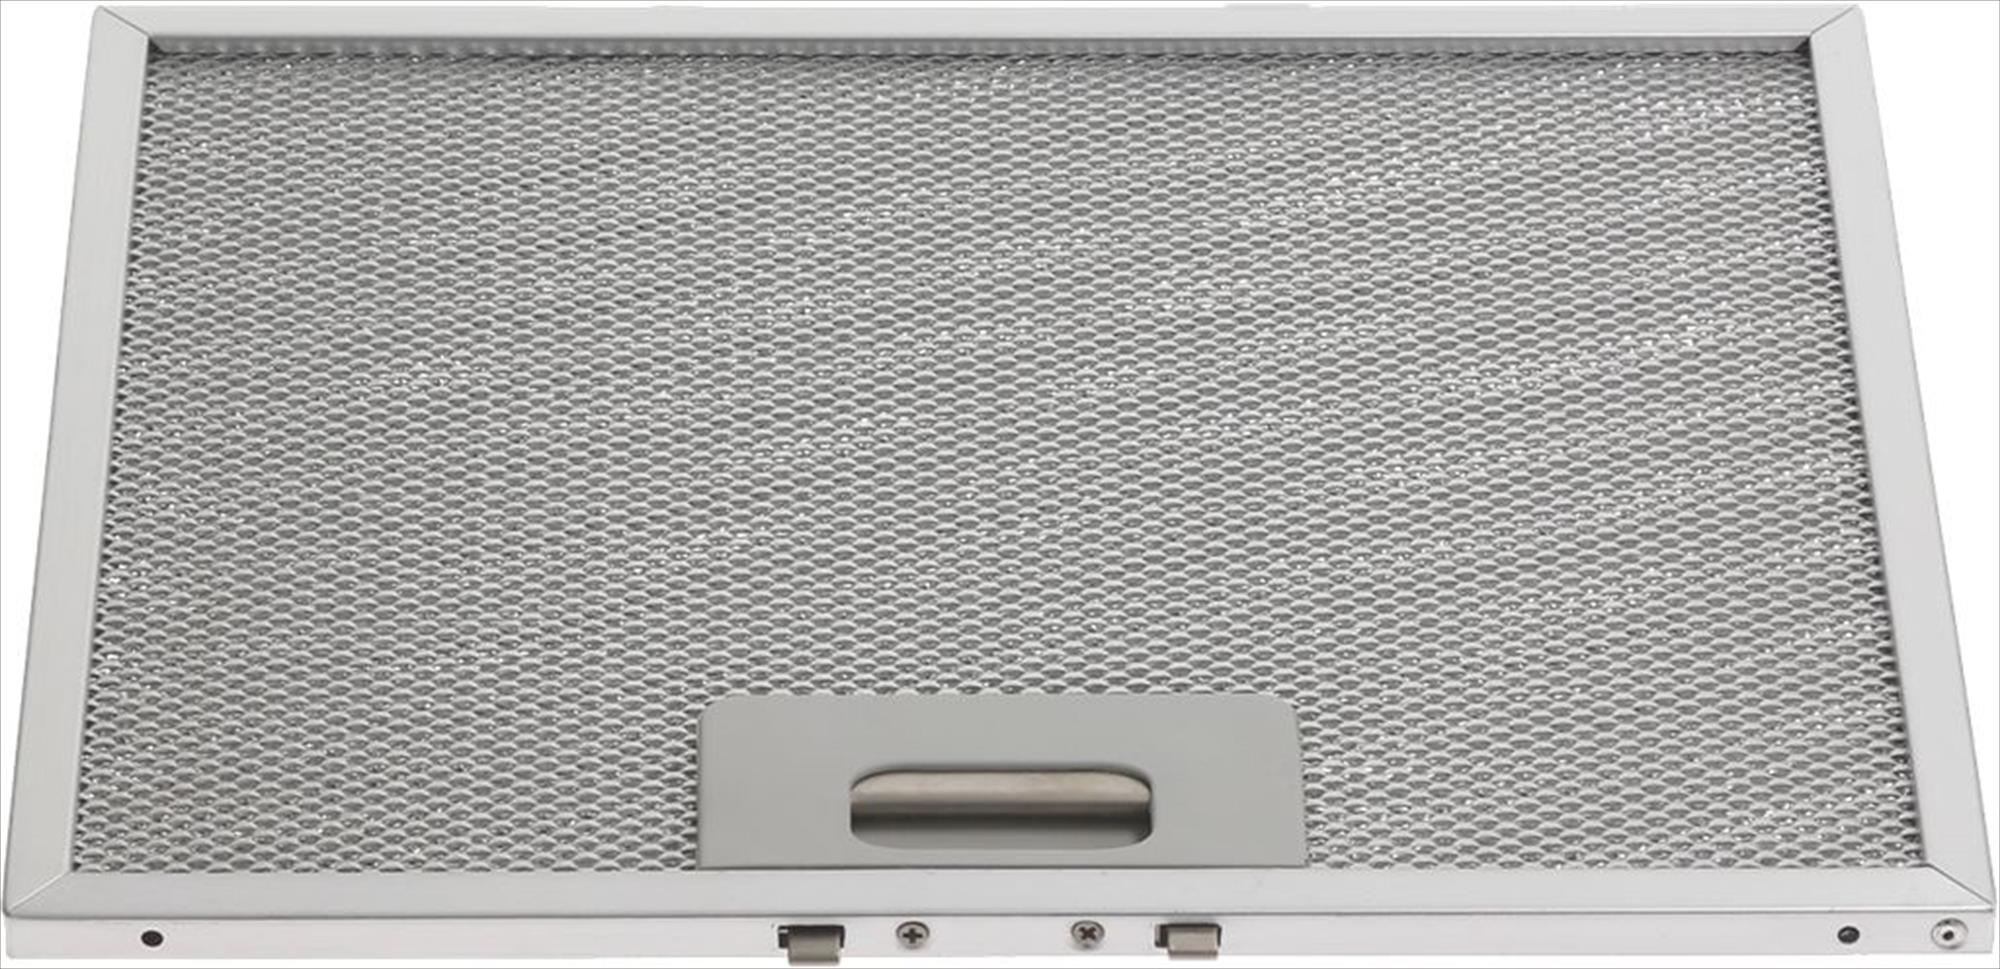 elica metallfilter f r dunstabzugshaube gf024a. Black Bedroom Furniture Sets. Home Design Ideas